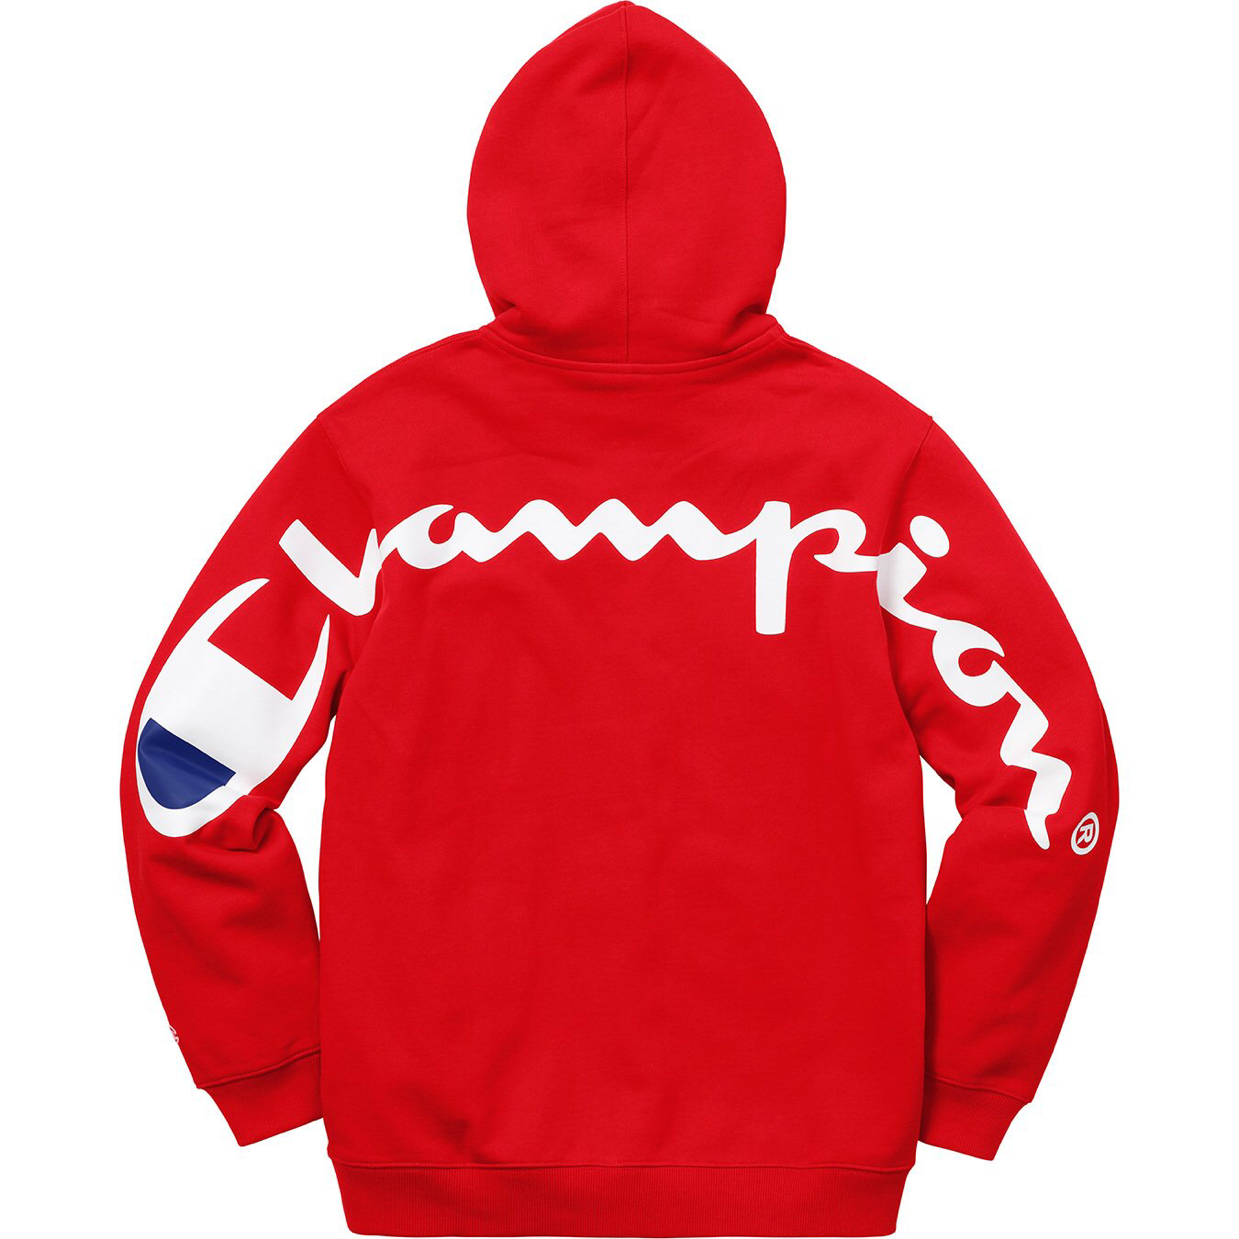 Fancy Supreme X Champion Hooded Sweatshirt Red X Large Champion Hooded Sweatshirt Stylish Hoodies Champion Clothing [ 1239 x 1239 Pixel ]